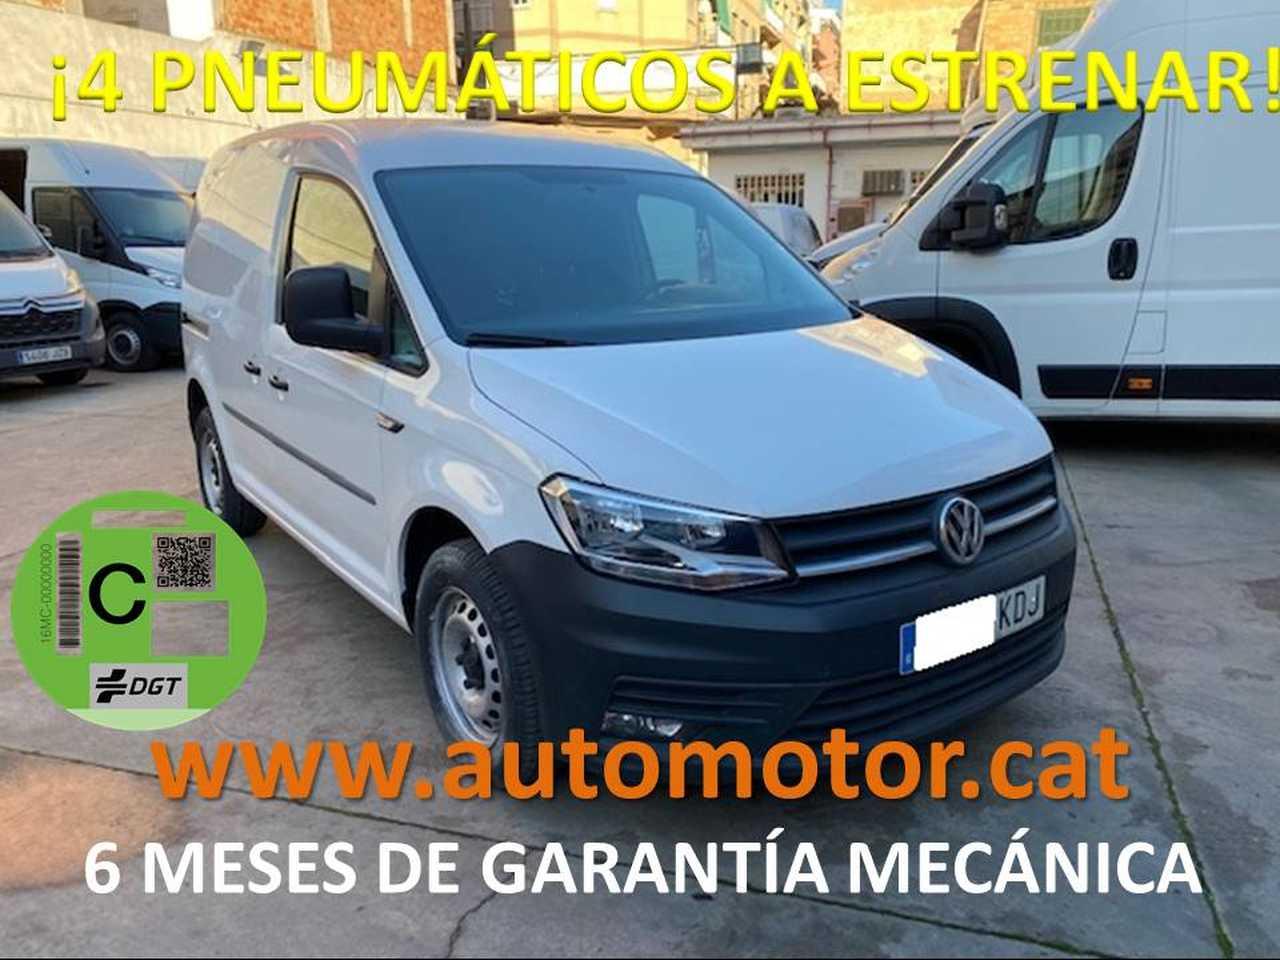 Volkswagen Caddy Furgón 2.0TDI 55kW - GARANTIA MECANICA  - Foto 1